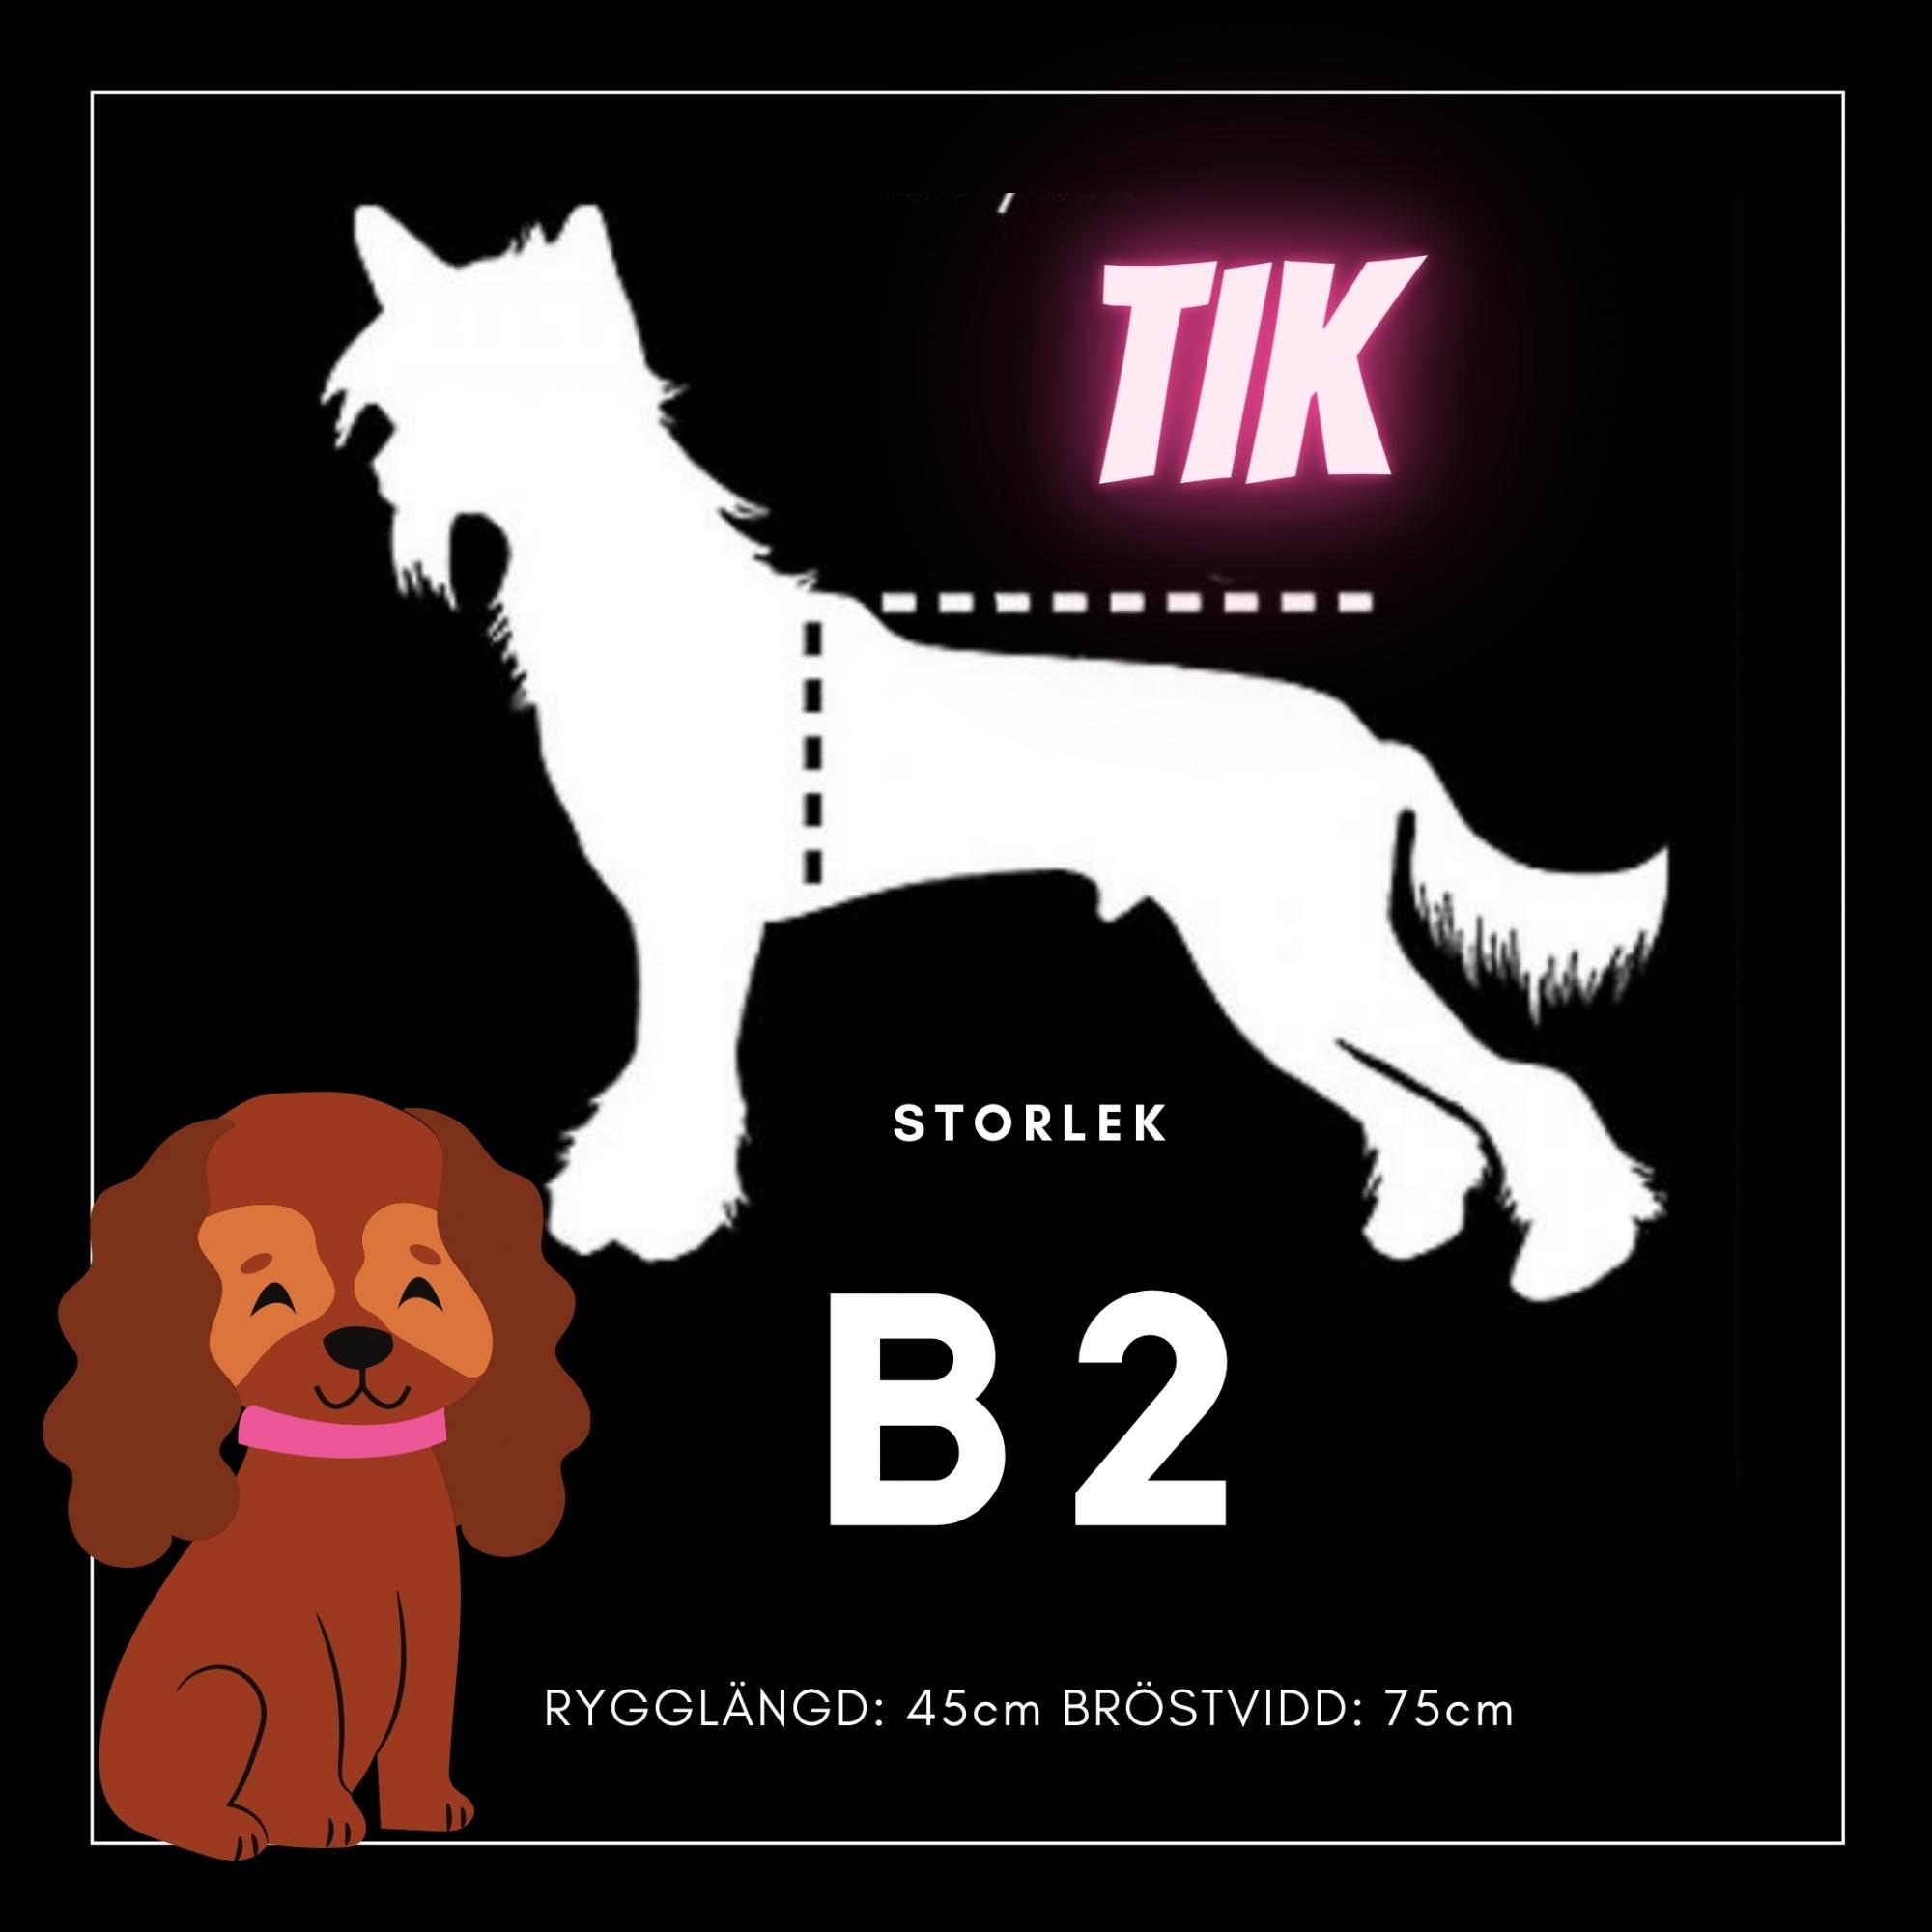 Tik Storlek B2 - Passion For Pet Fashion